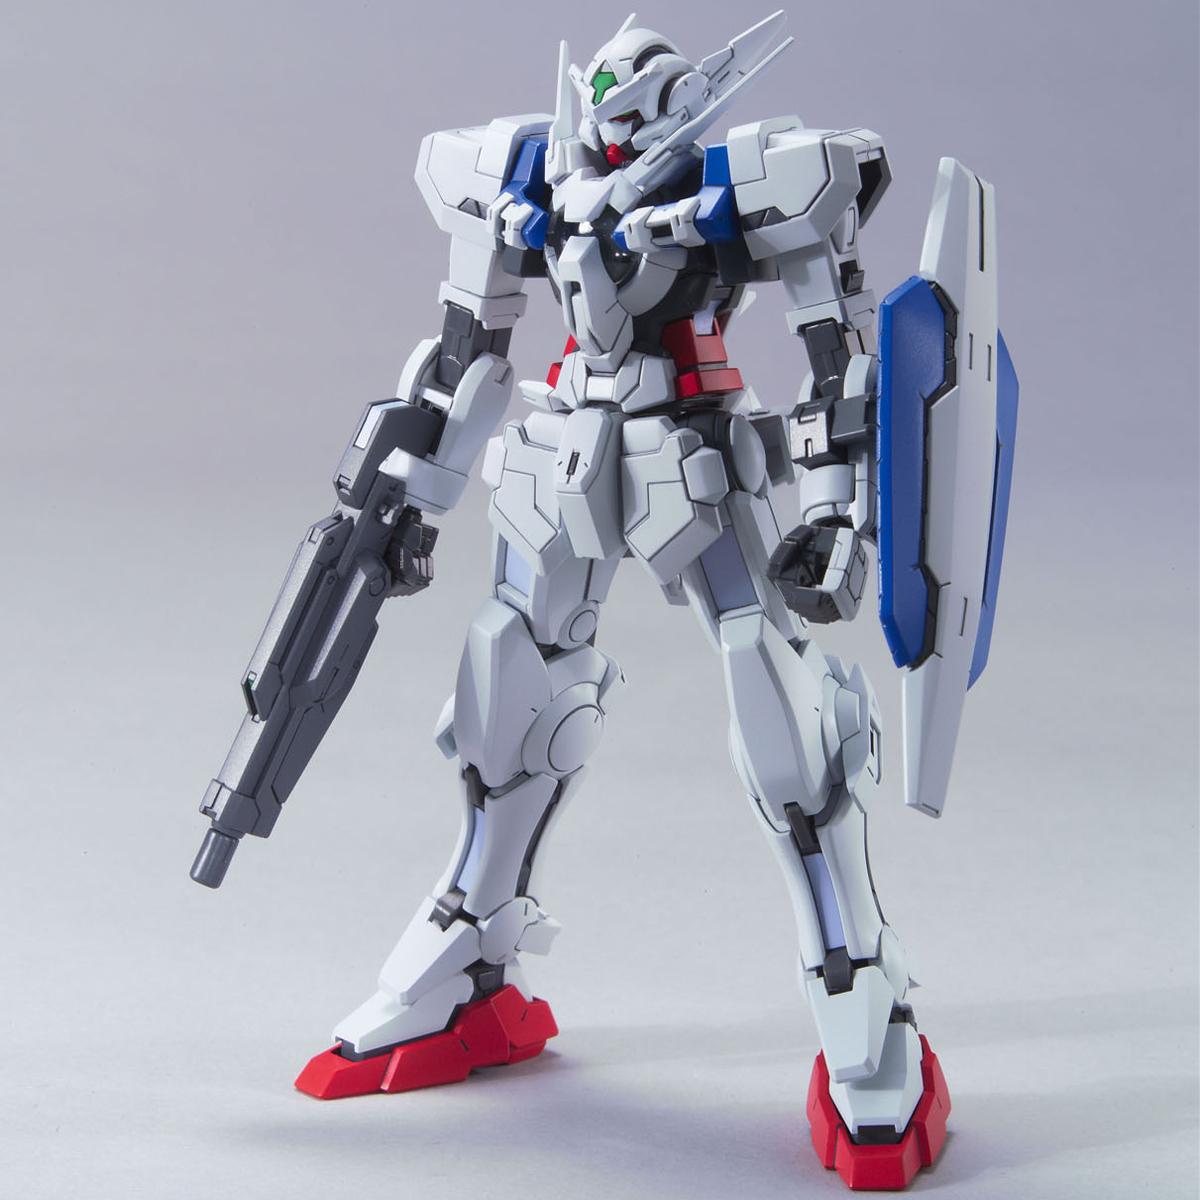 6742HG 1/144 GNY-001 ガンダムアストレア [Gundam Astraea]